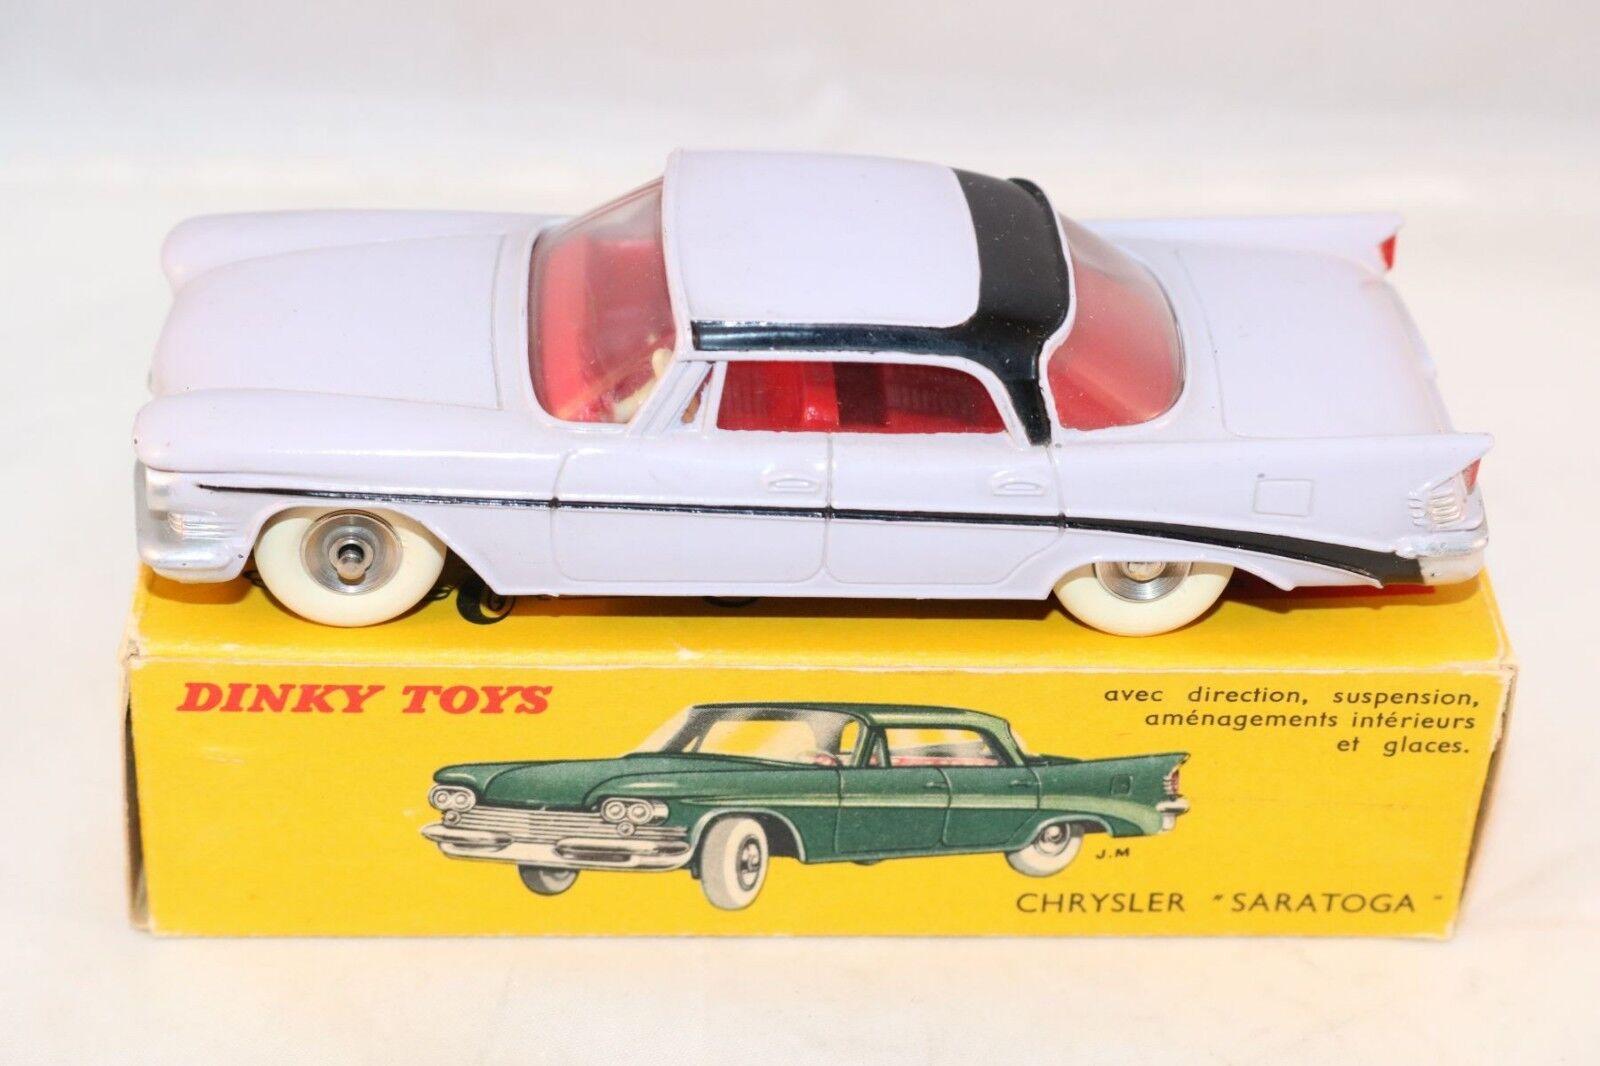 Dinky Toys 550 Chrysler  Saratoga  2 tone violac very near mint in box SUPERB